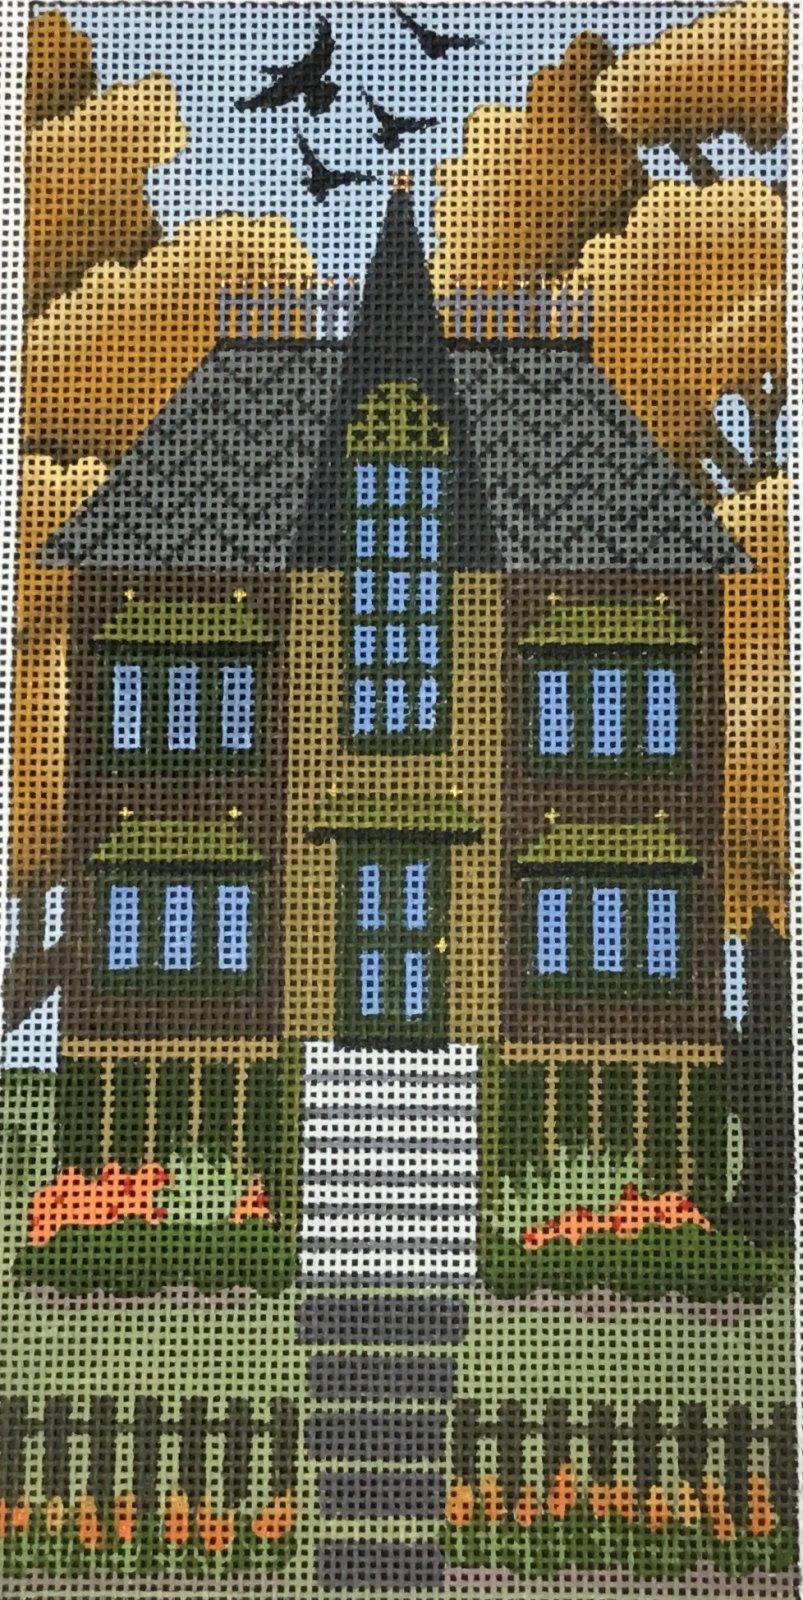 Olive Autumn House, 18M, 4x8.25